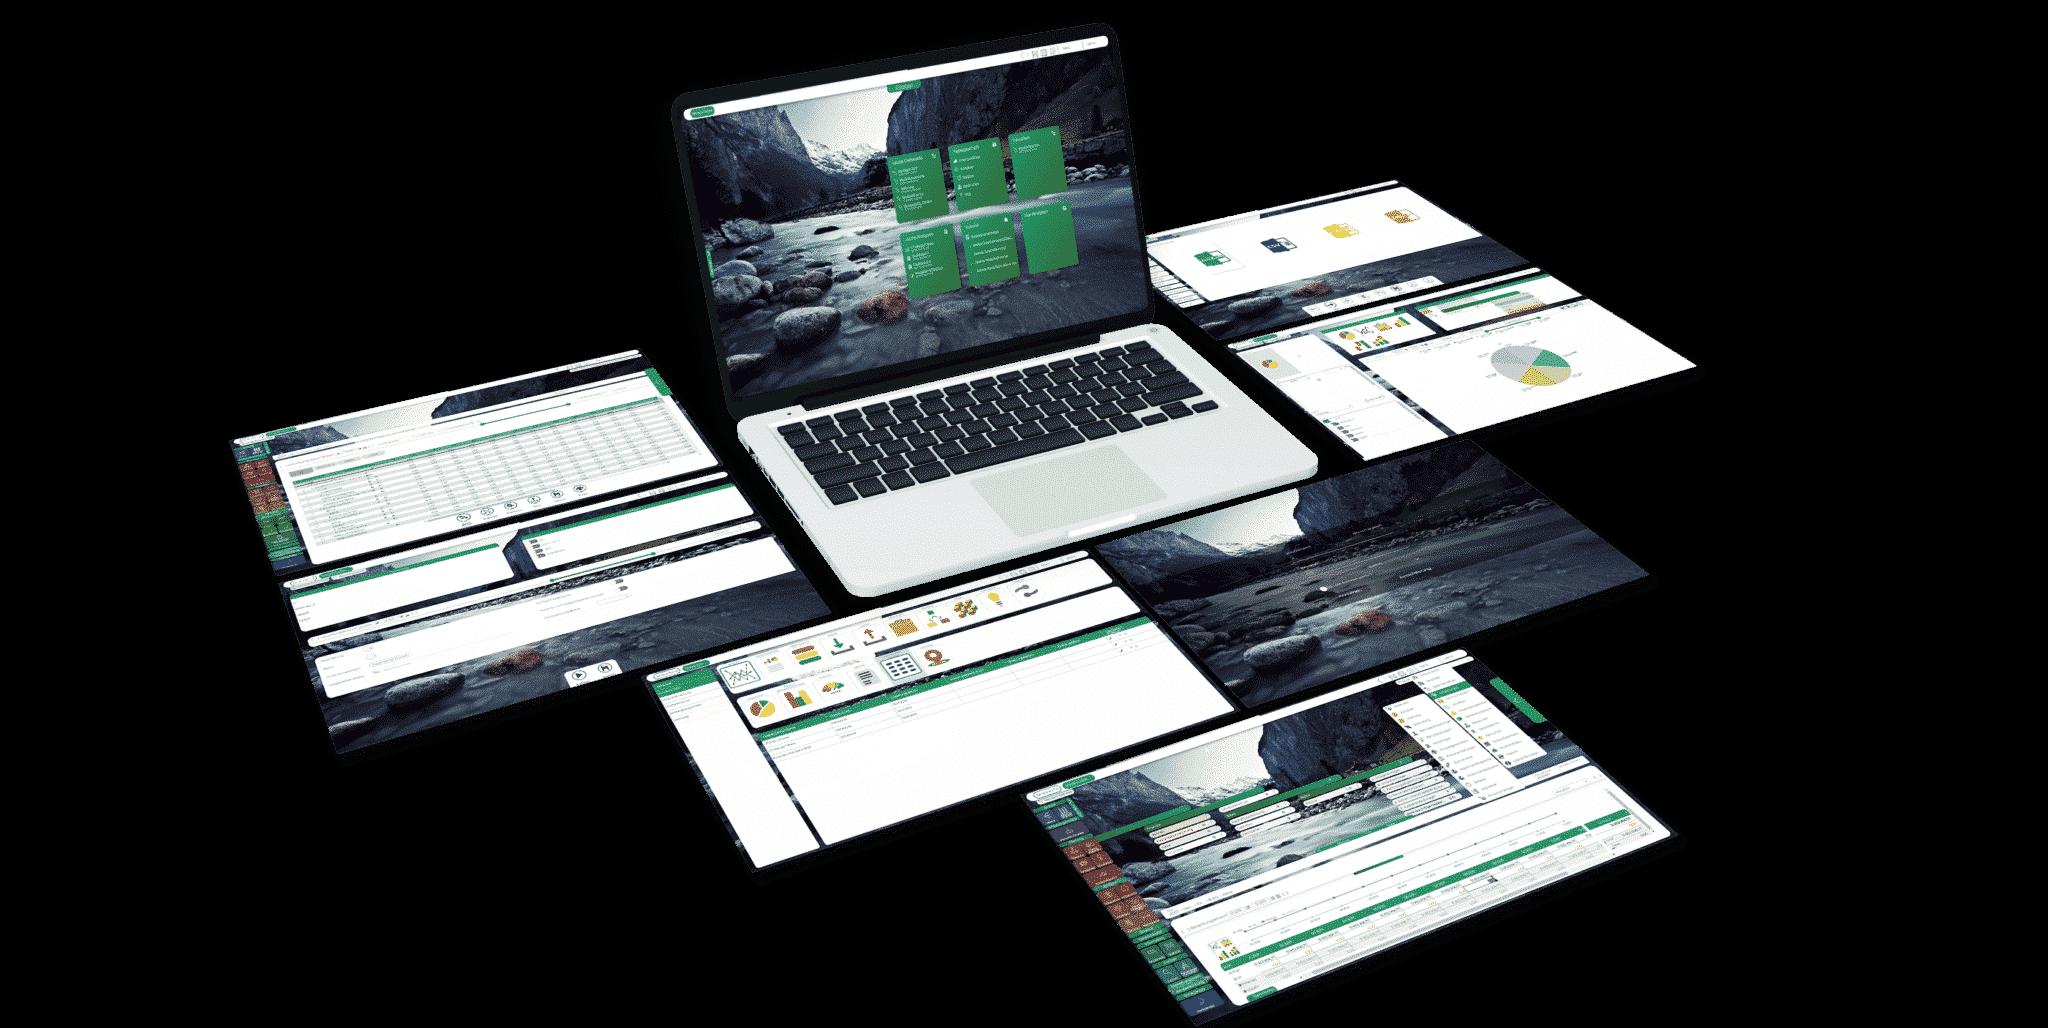 seneca controlling software oberfläche